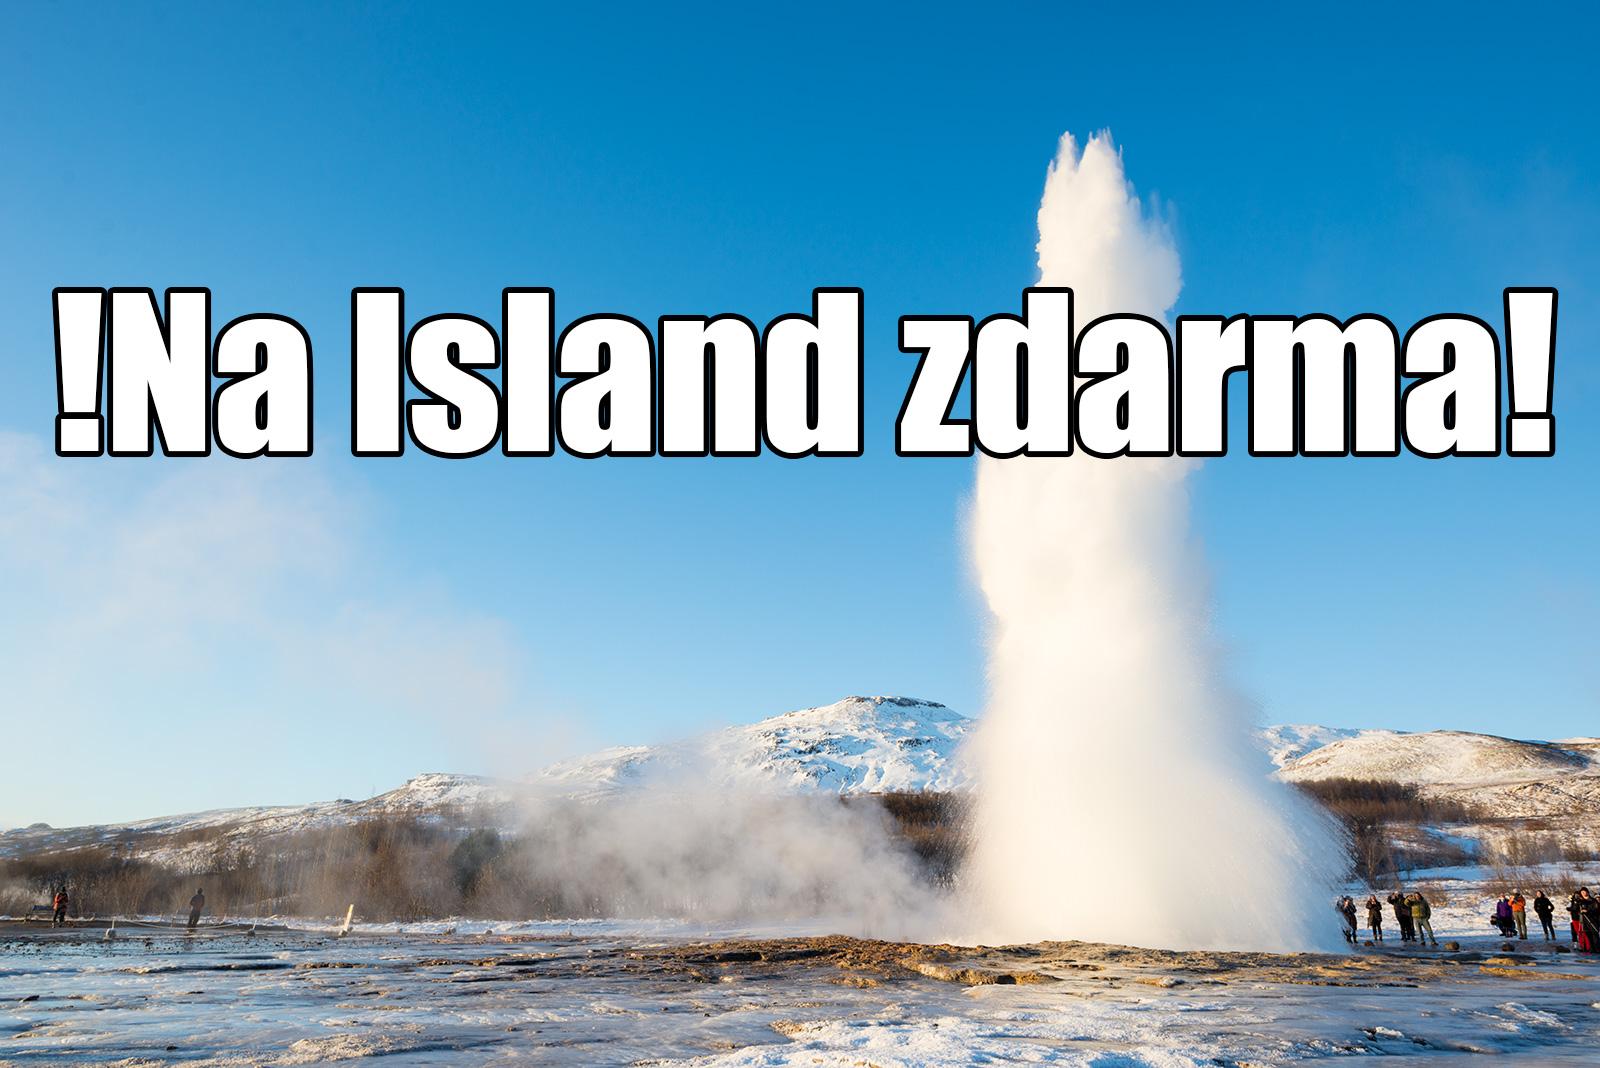 Island (skoro) zdarma – jde to!